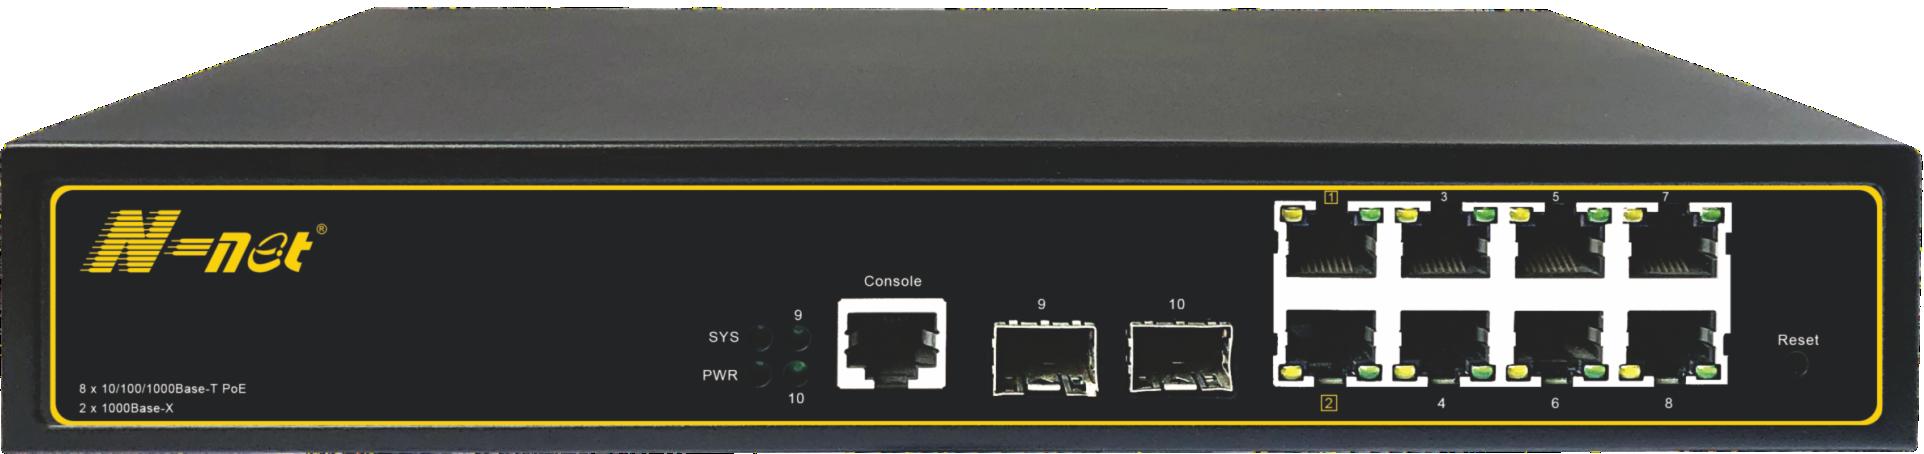 NC3082SGM 10口全千兆網管交換機系列